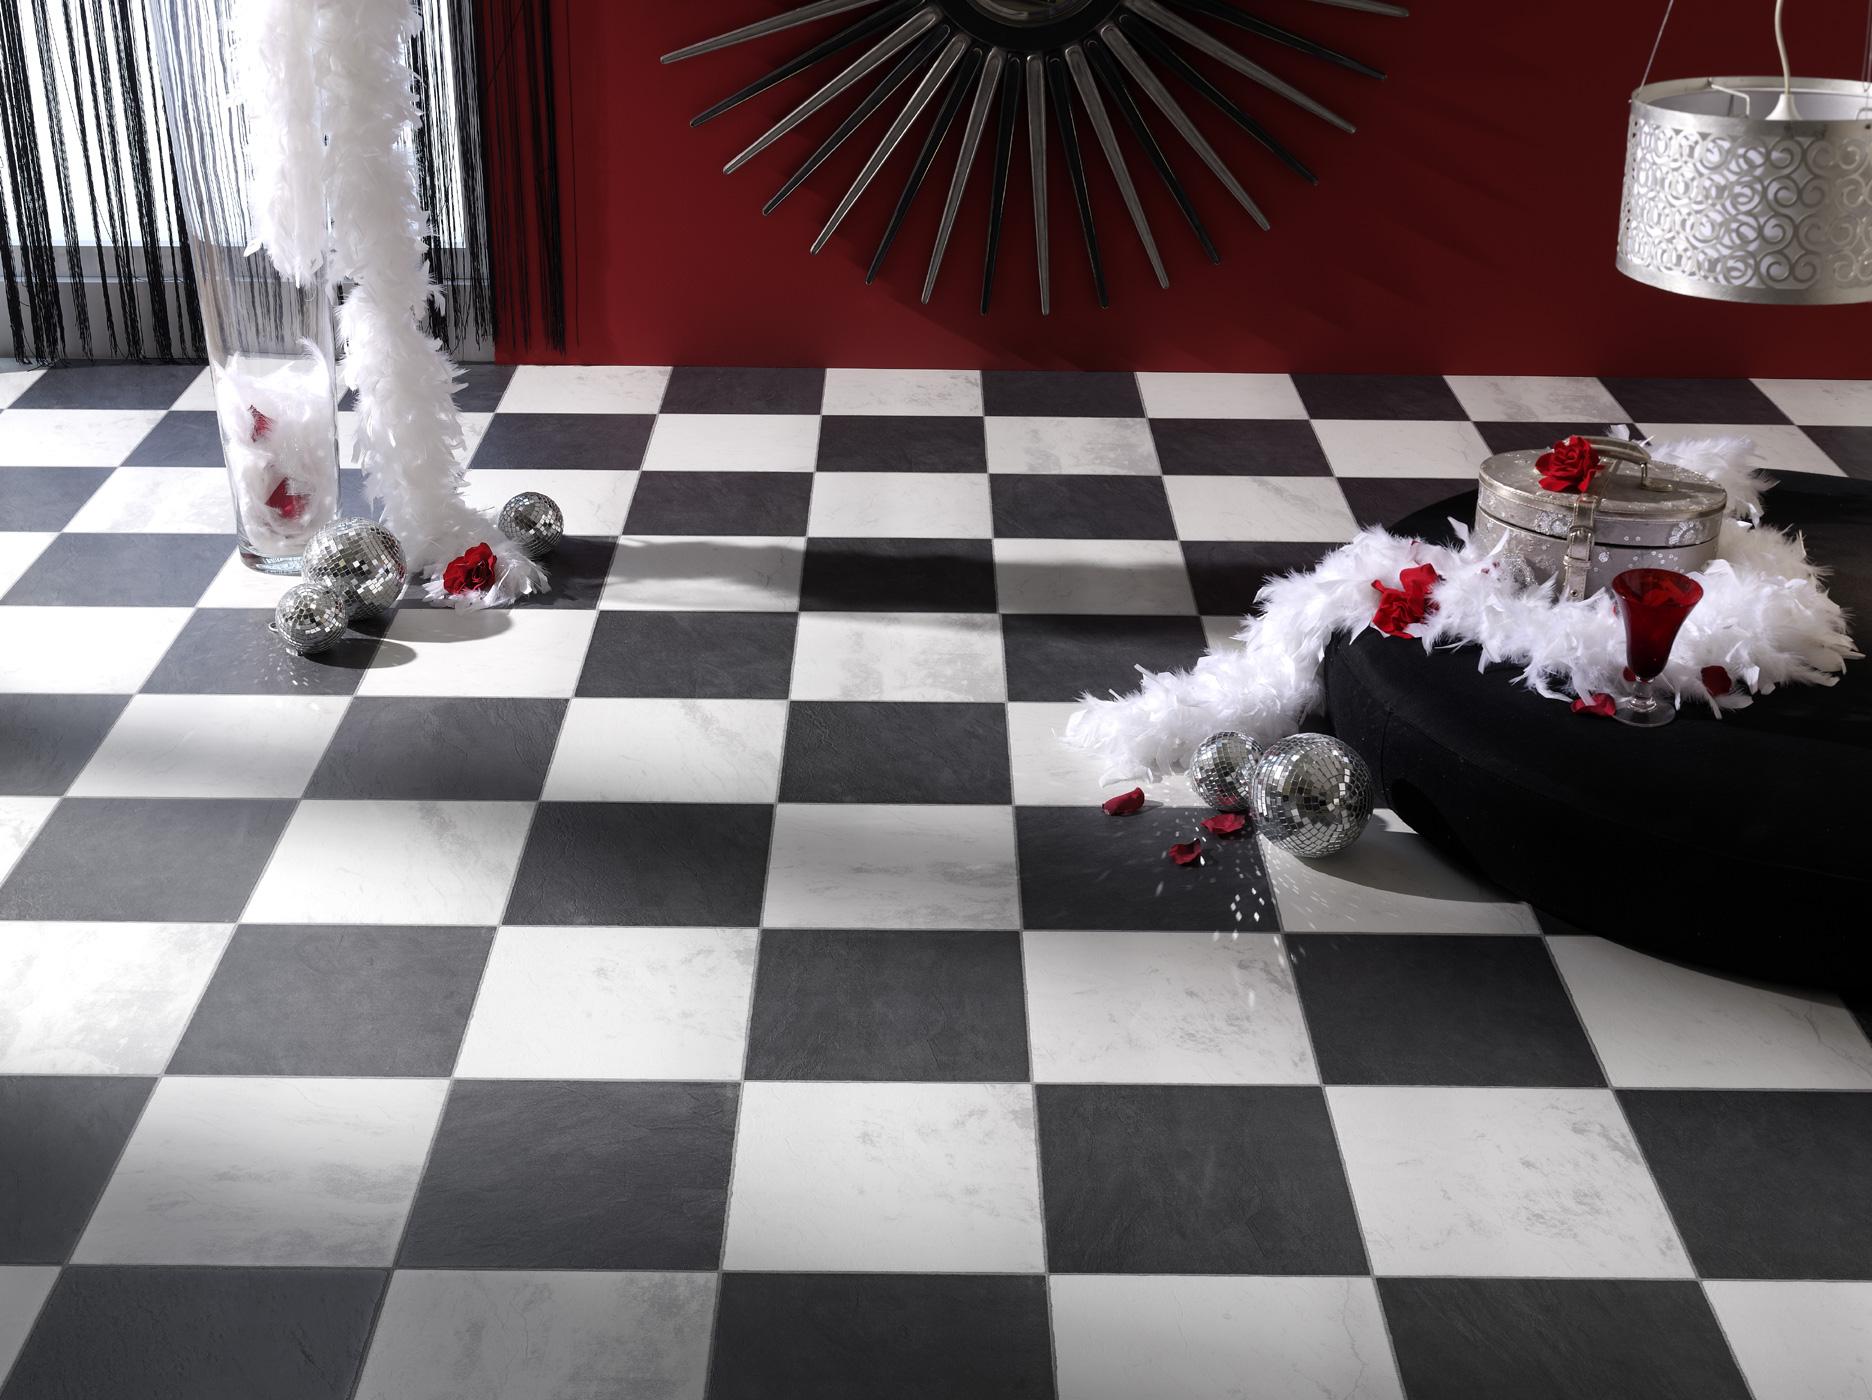 faus laminaat tegels chess black zwart wit geblokt